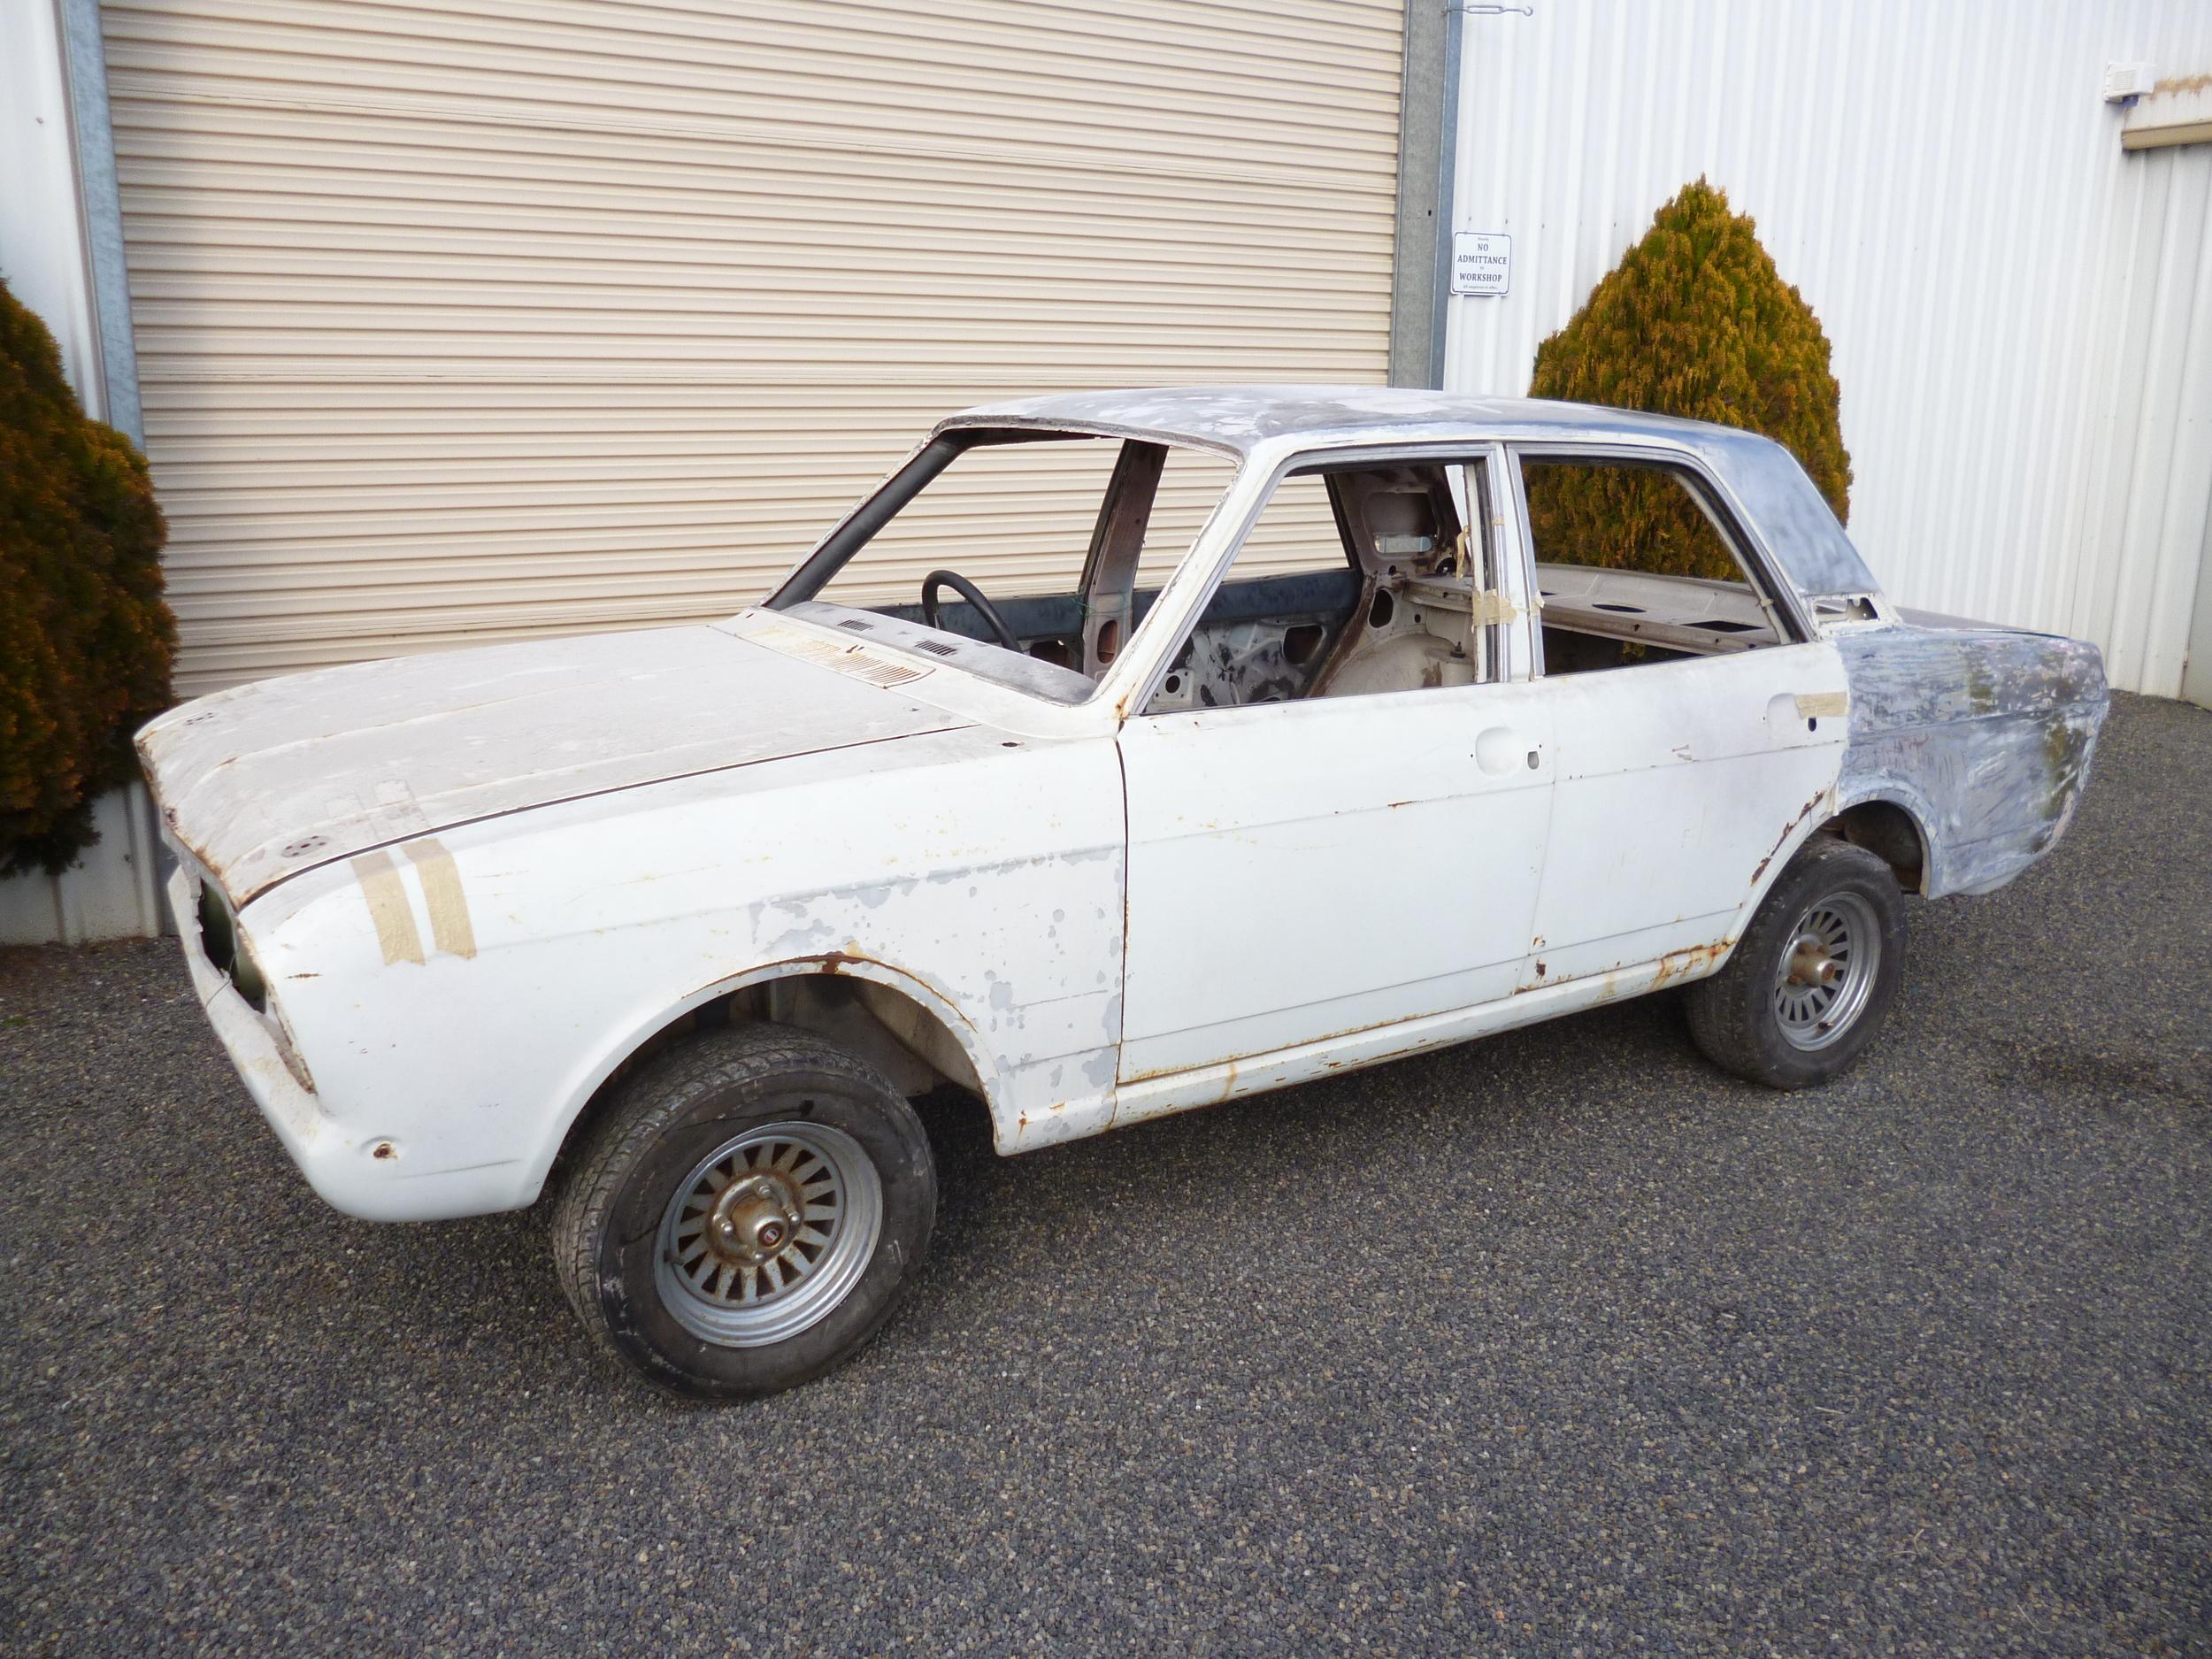 Ford Cortina GT rally car.